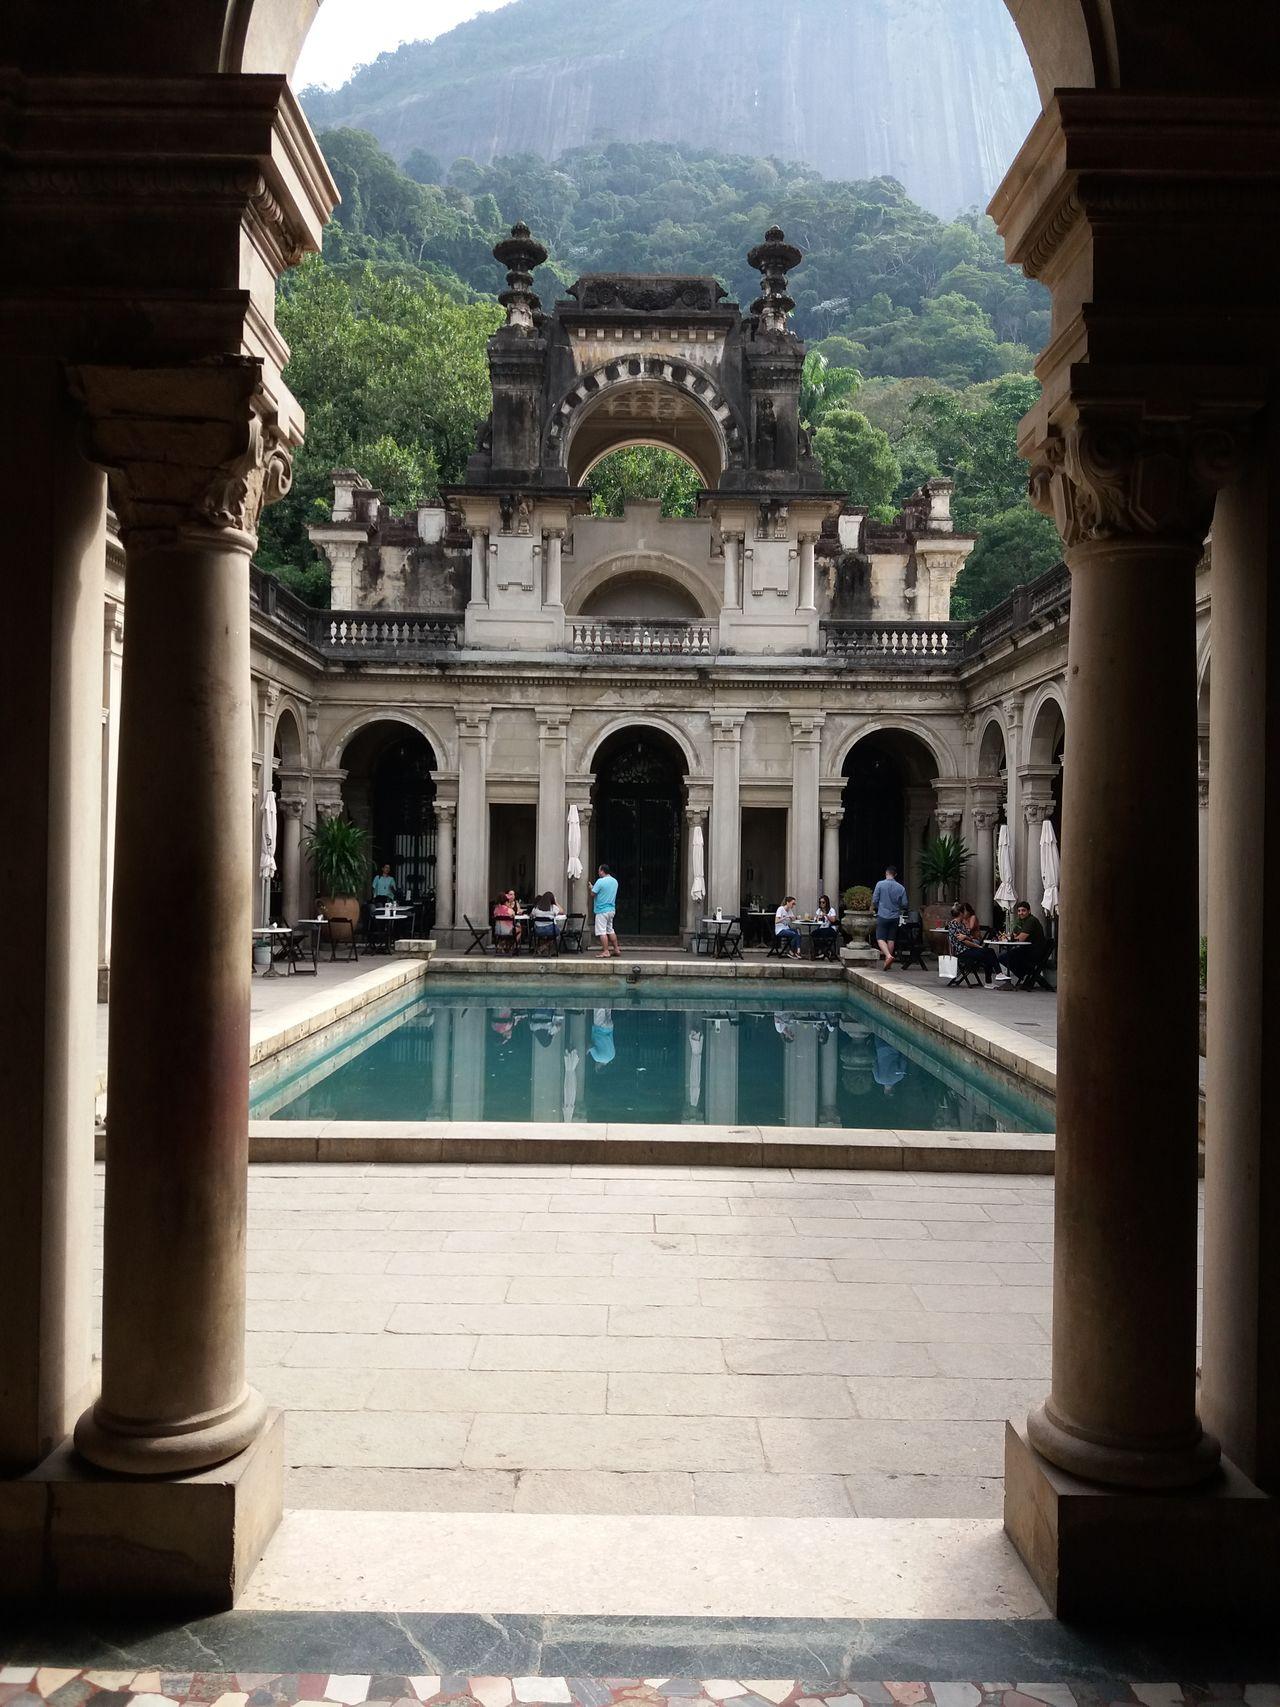 Nofilter Noedit Architecture Tree Day Swimming Pool Cristoredentor Parquelage Rio De Janeiro Eyeem Fotos Collection⛵ Rio De Janeiro Rio De Janeiro, Brazil Zonasul Top